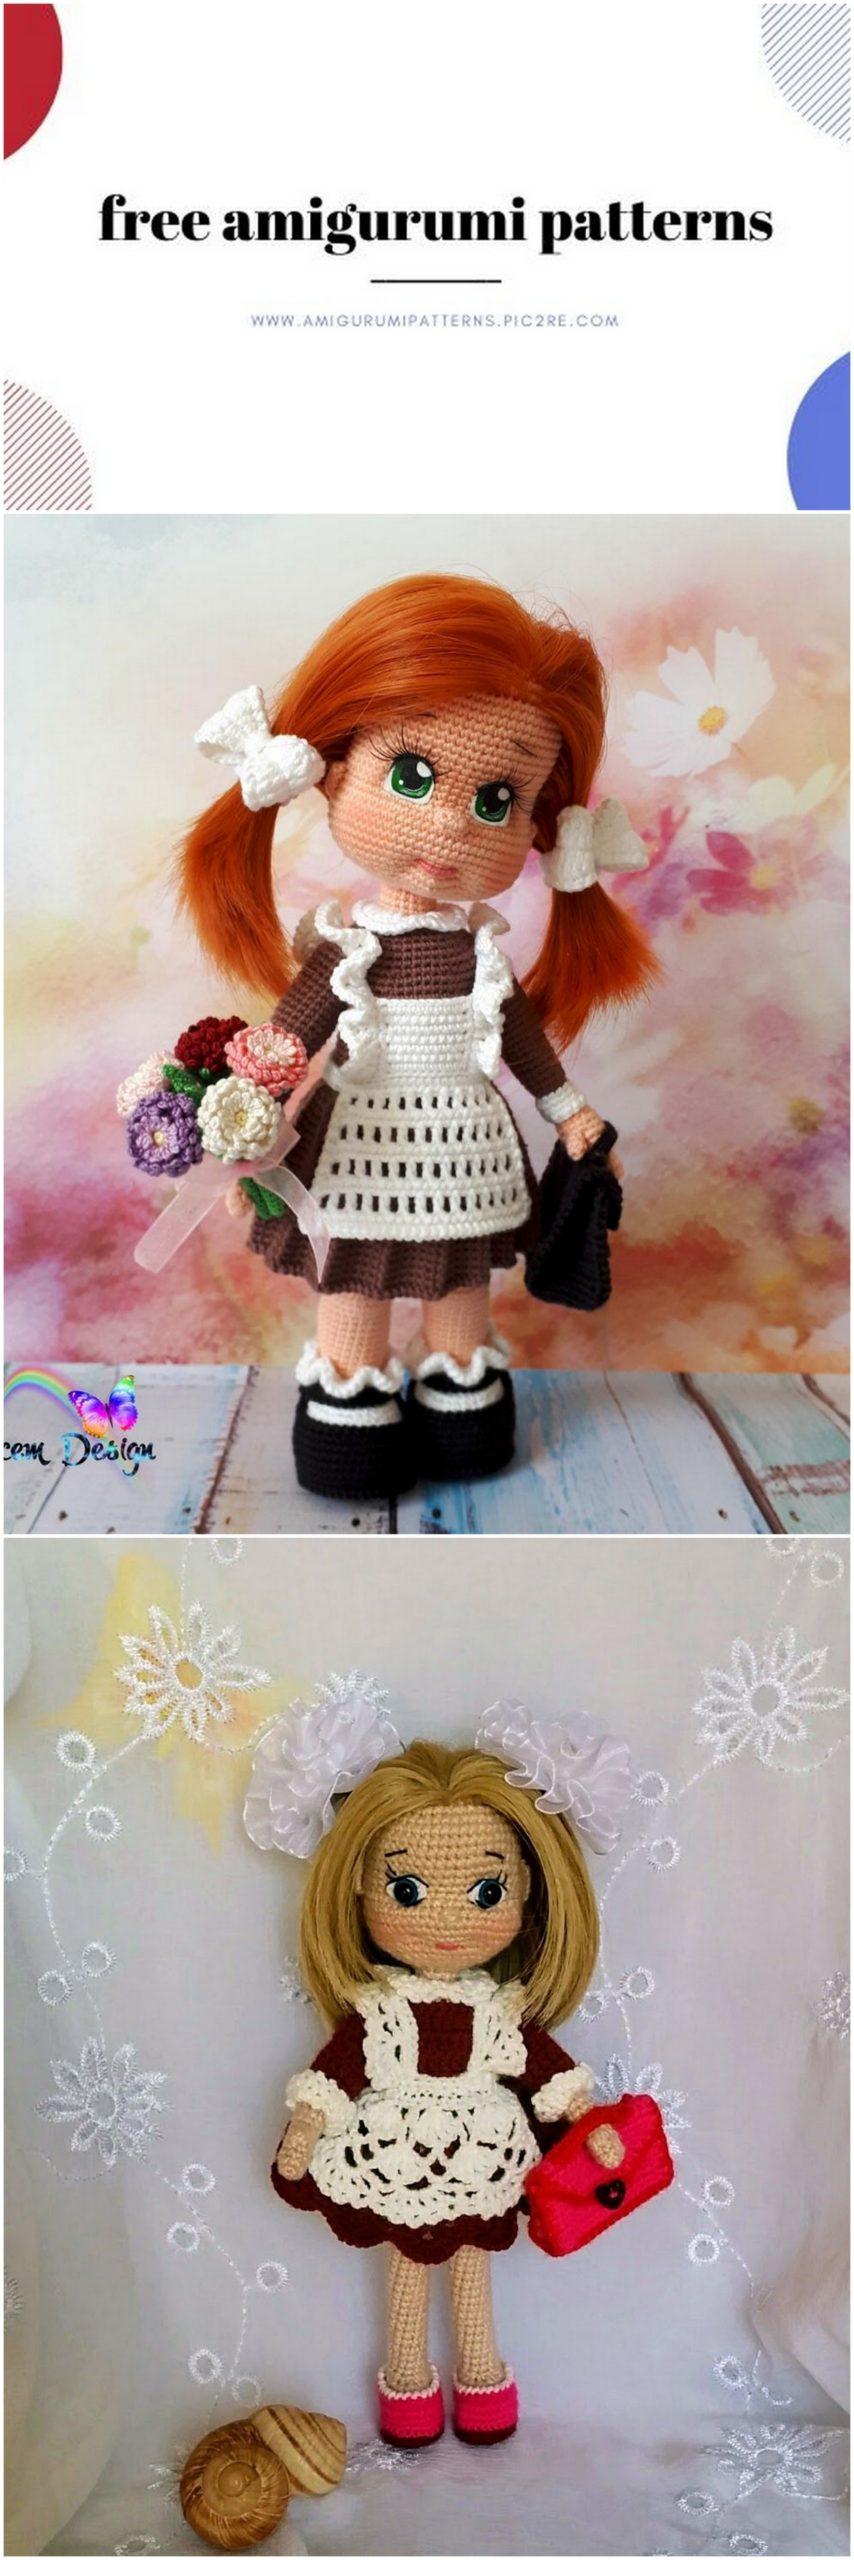 Petite School Girl Amigurumi Doll (Anime Japanese French European)   2560x854